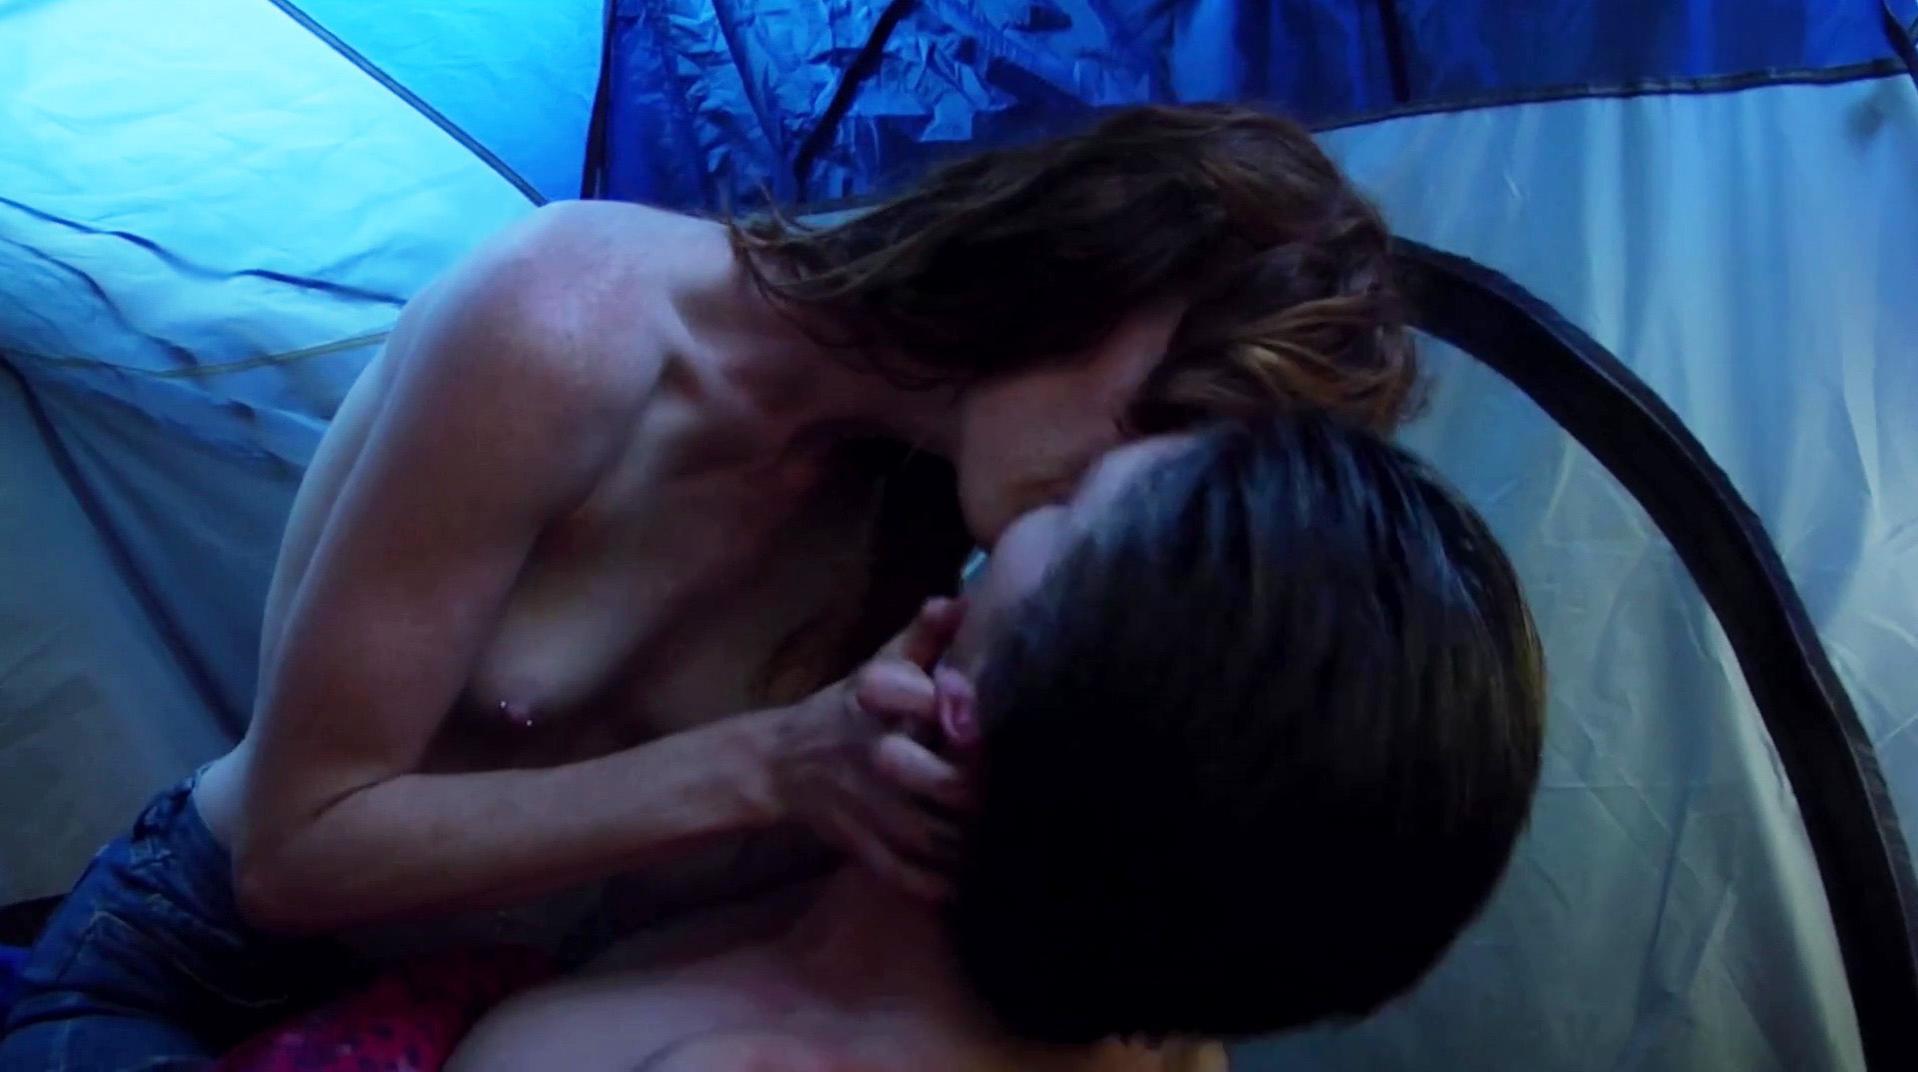 Jill Evyn nude - Axe Giant: The Wrath of Paul Bunyan (2013)